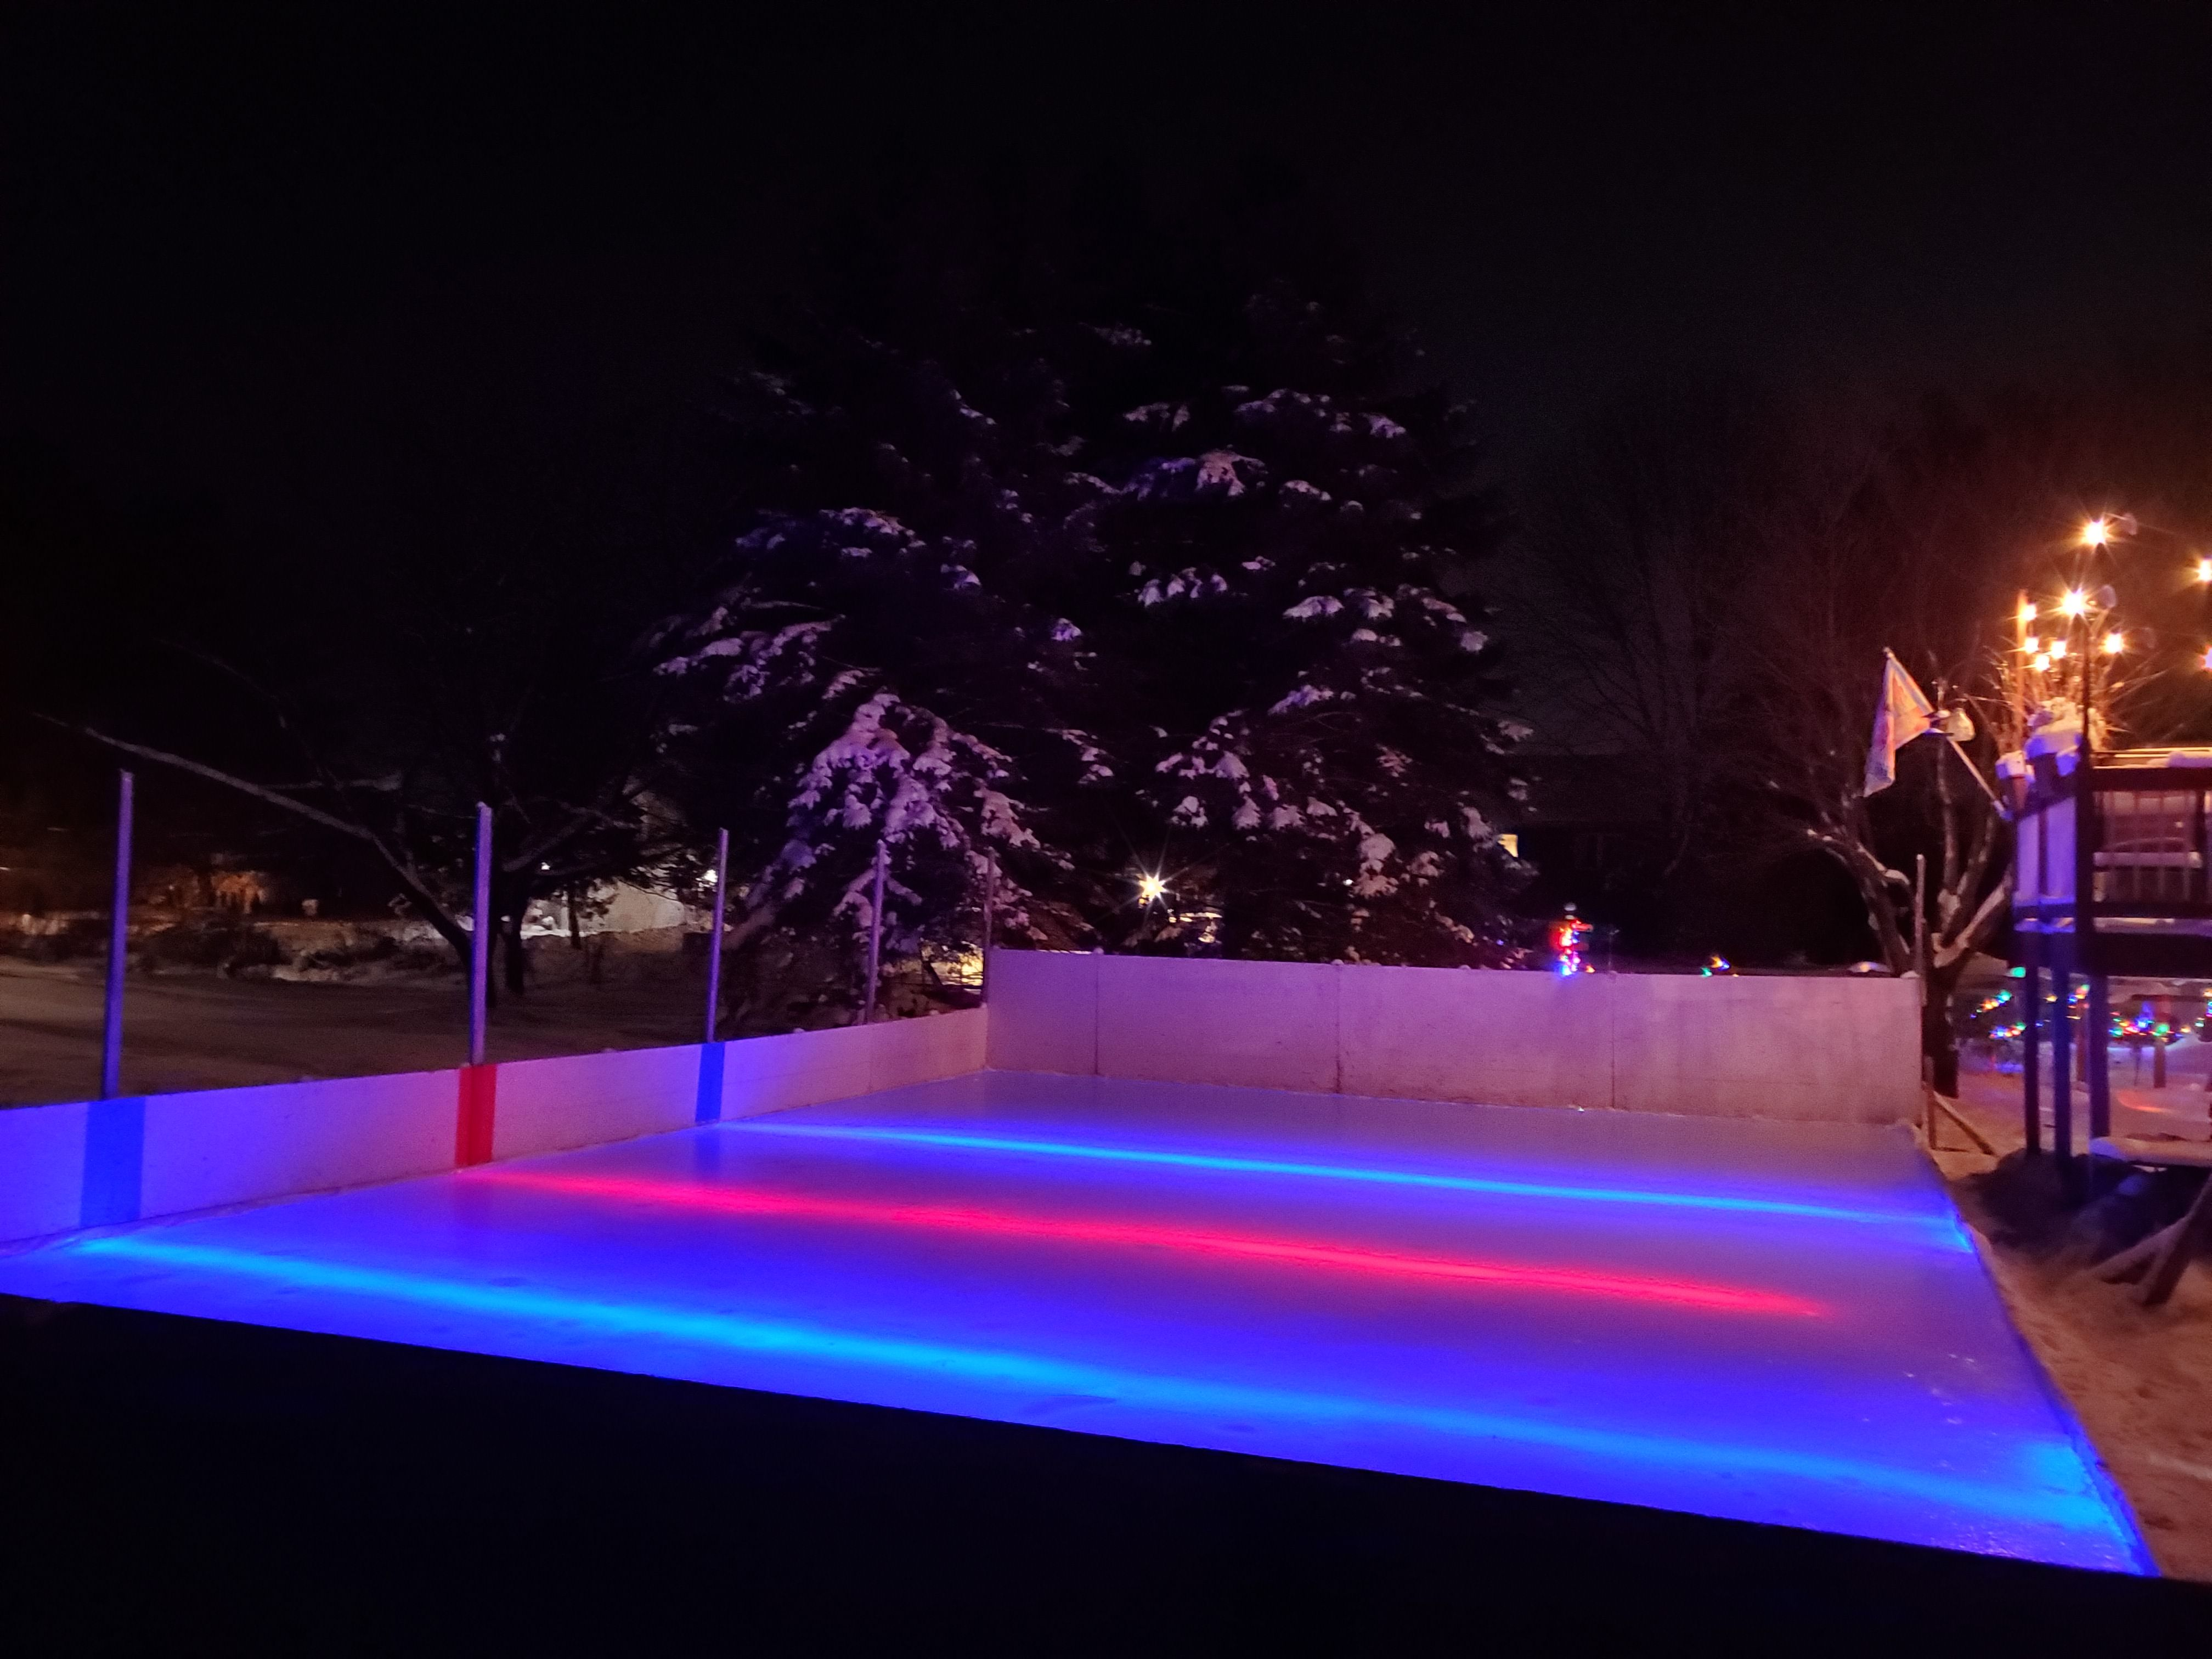 Pin By Nicerink Com On Under Ice Nicelights Backyard Ice Rink Backyard Hockey Rink Backyard Hockey Backyard ice rink kit reviews